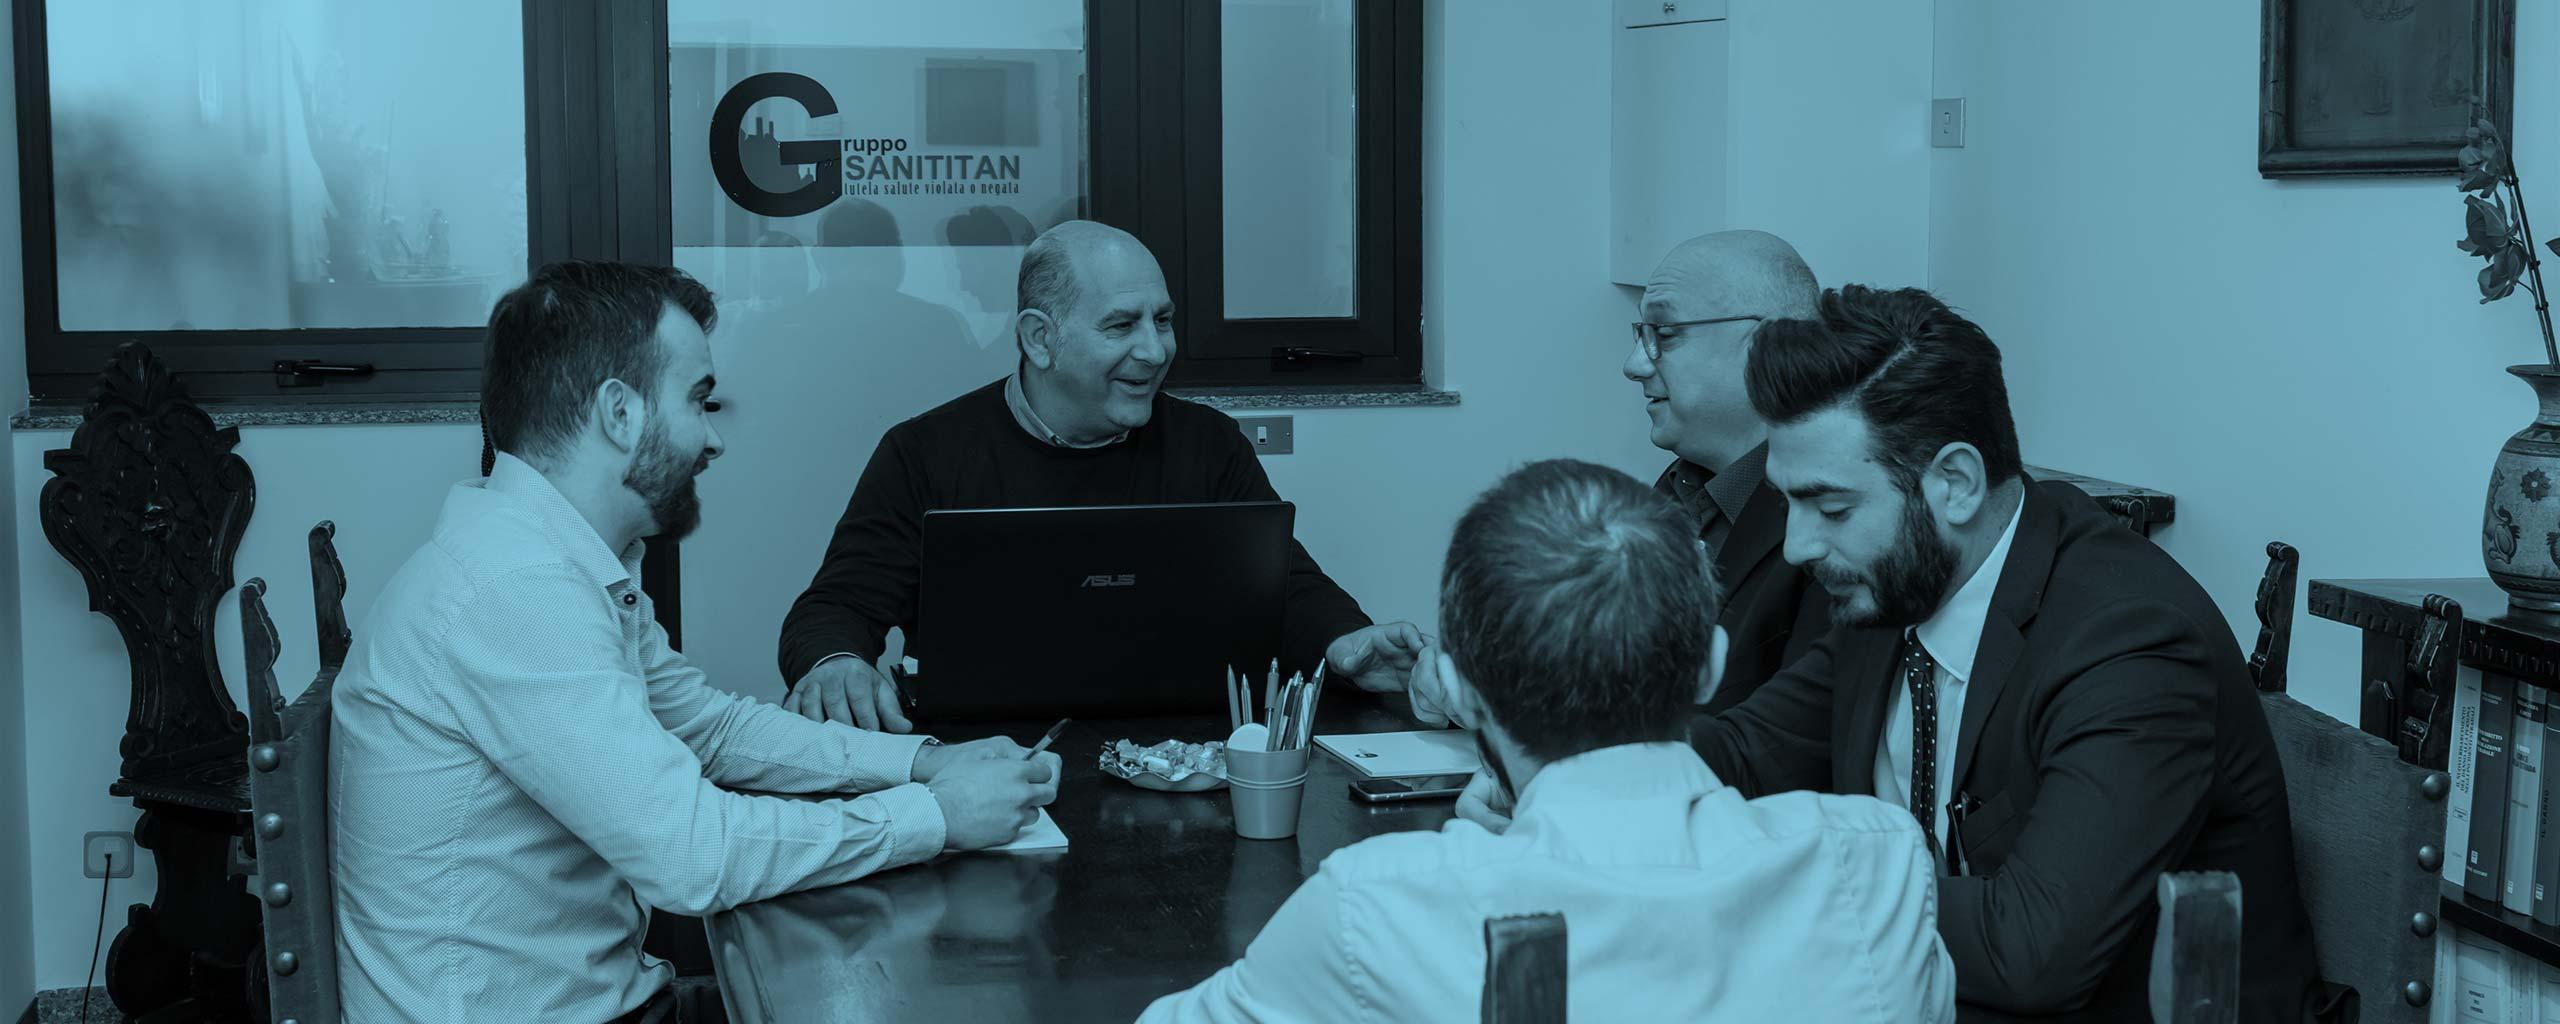 Gruppo Sanititan - Consulenti per casi di Malasanità